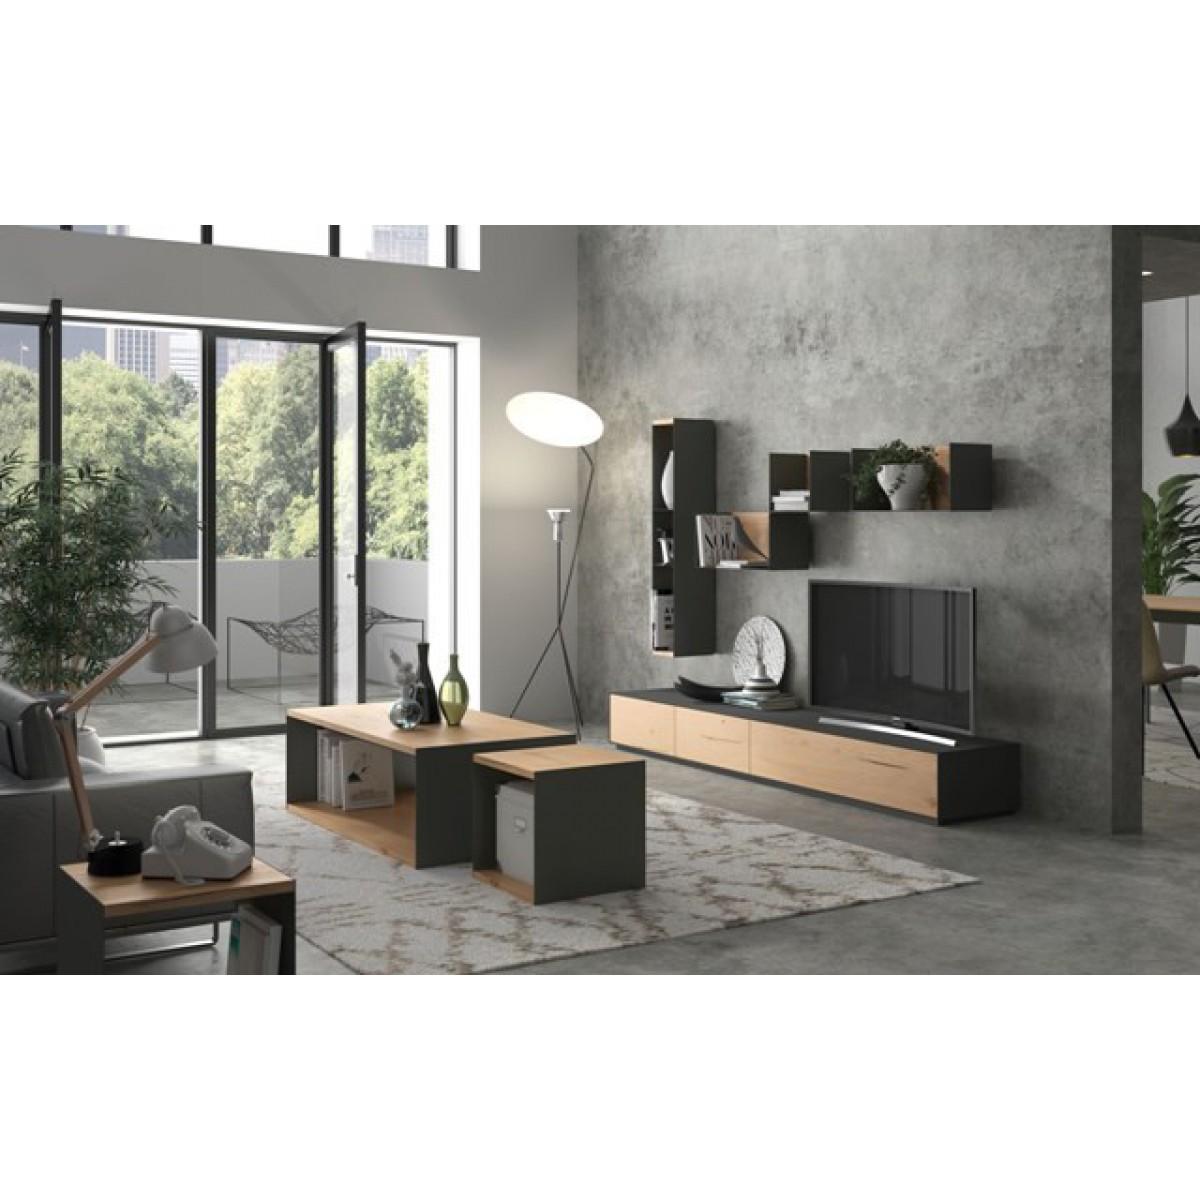 tv-meubel-sokkel-dressoir-brooklyn-eiken-metaaal-BR11_S2-miltonhouse-sfeer